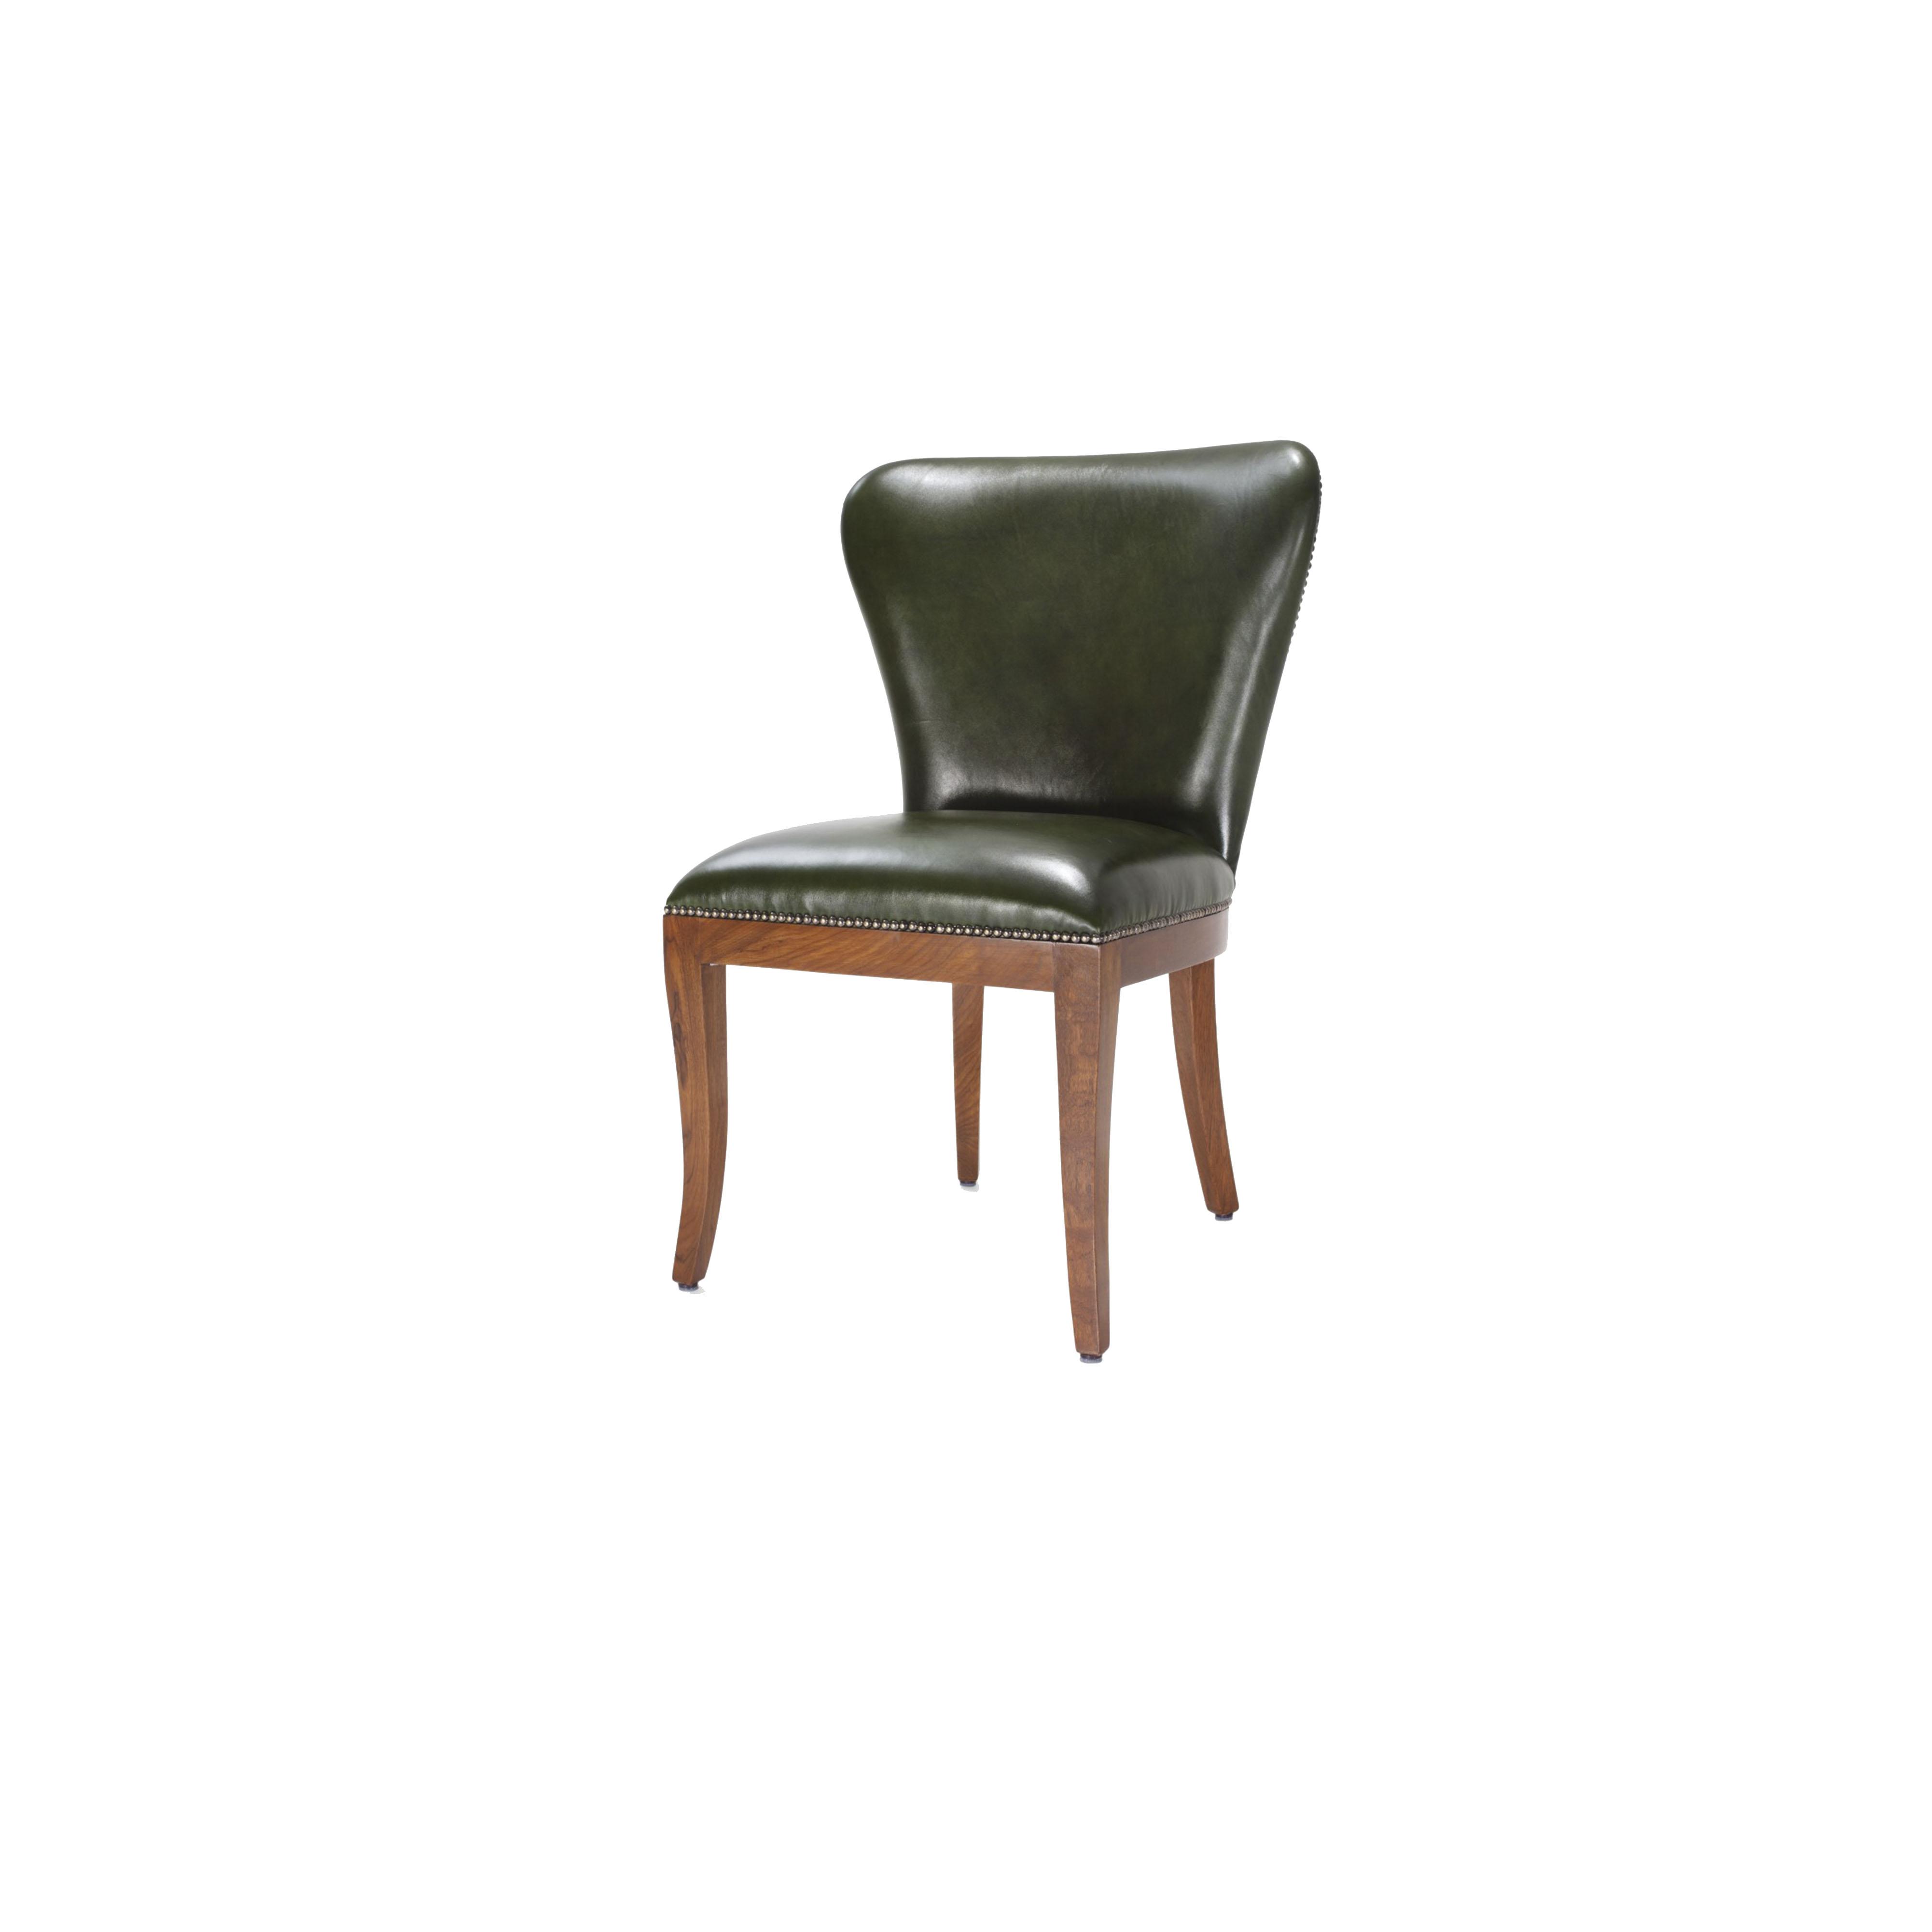 Raina dining chair